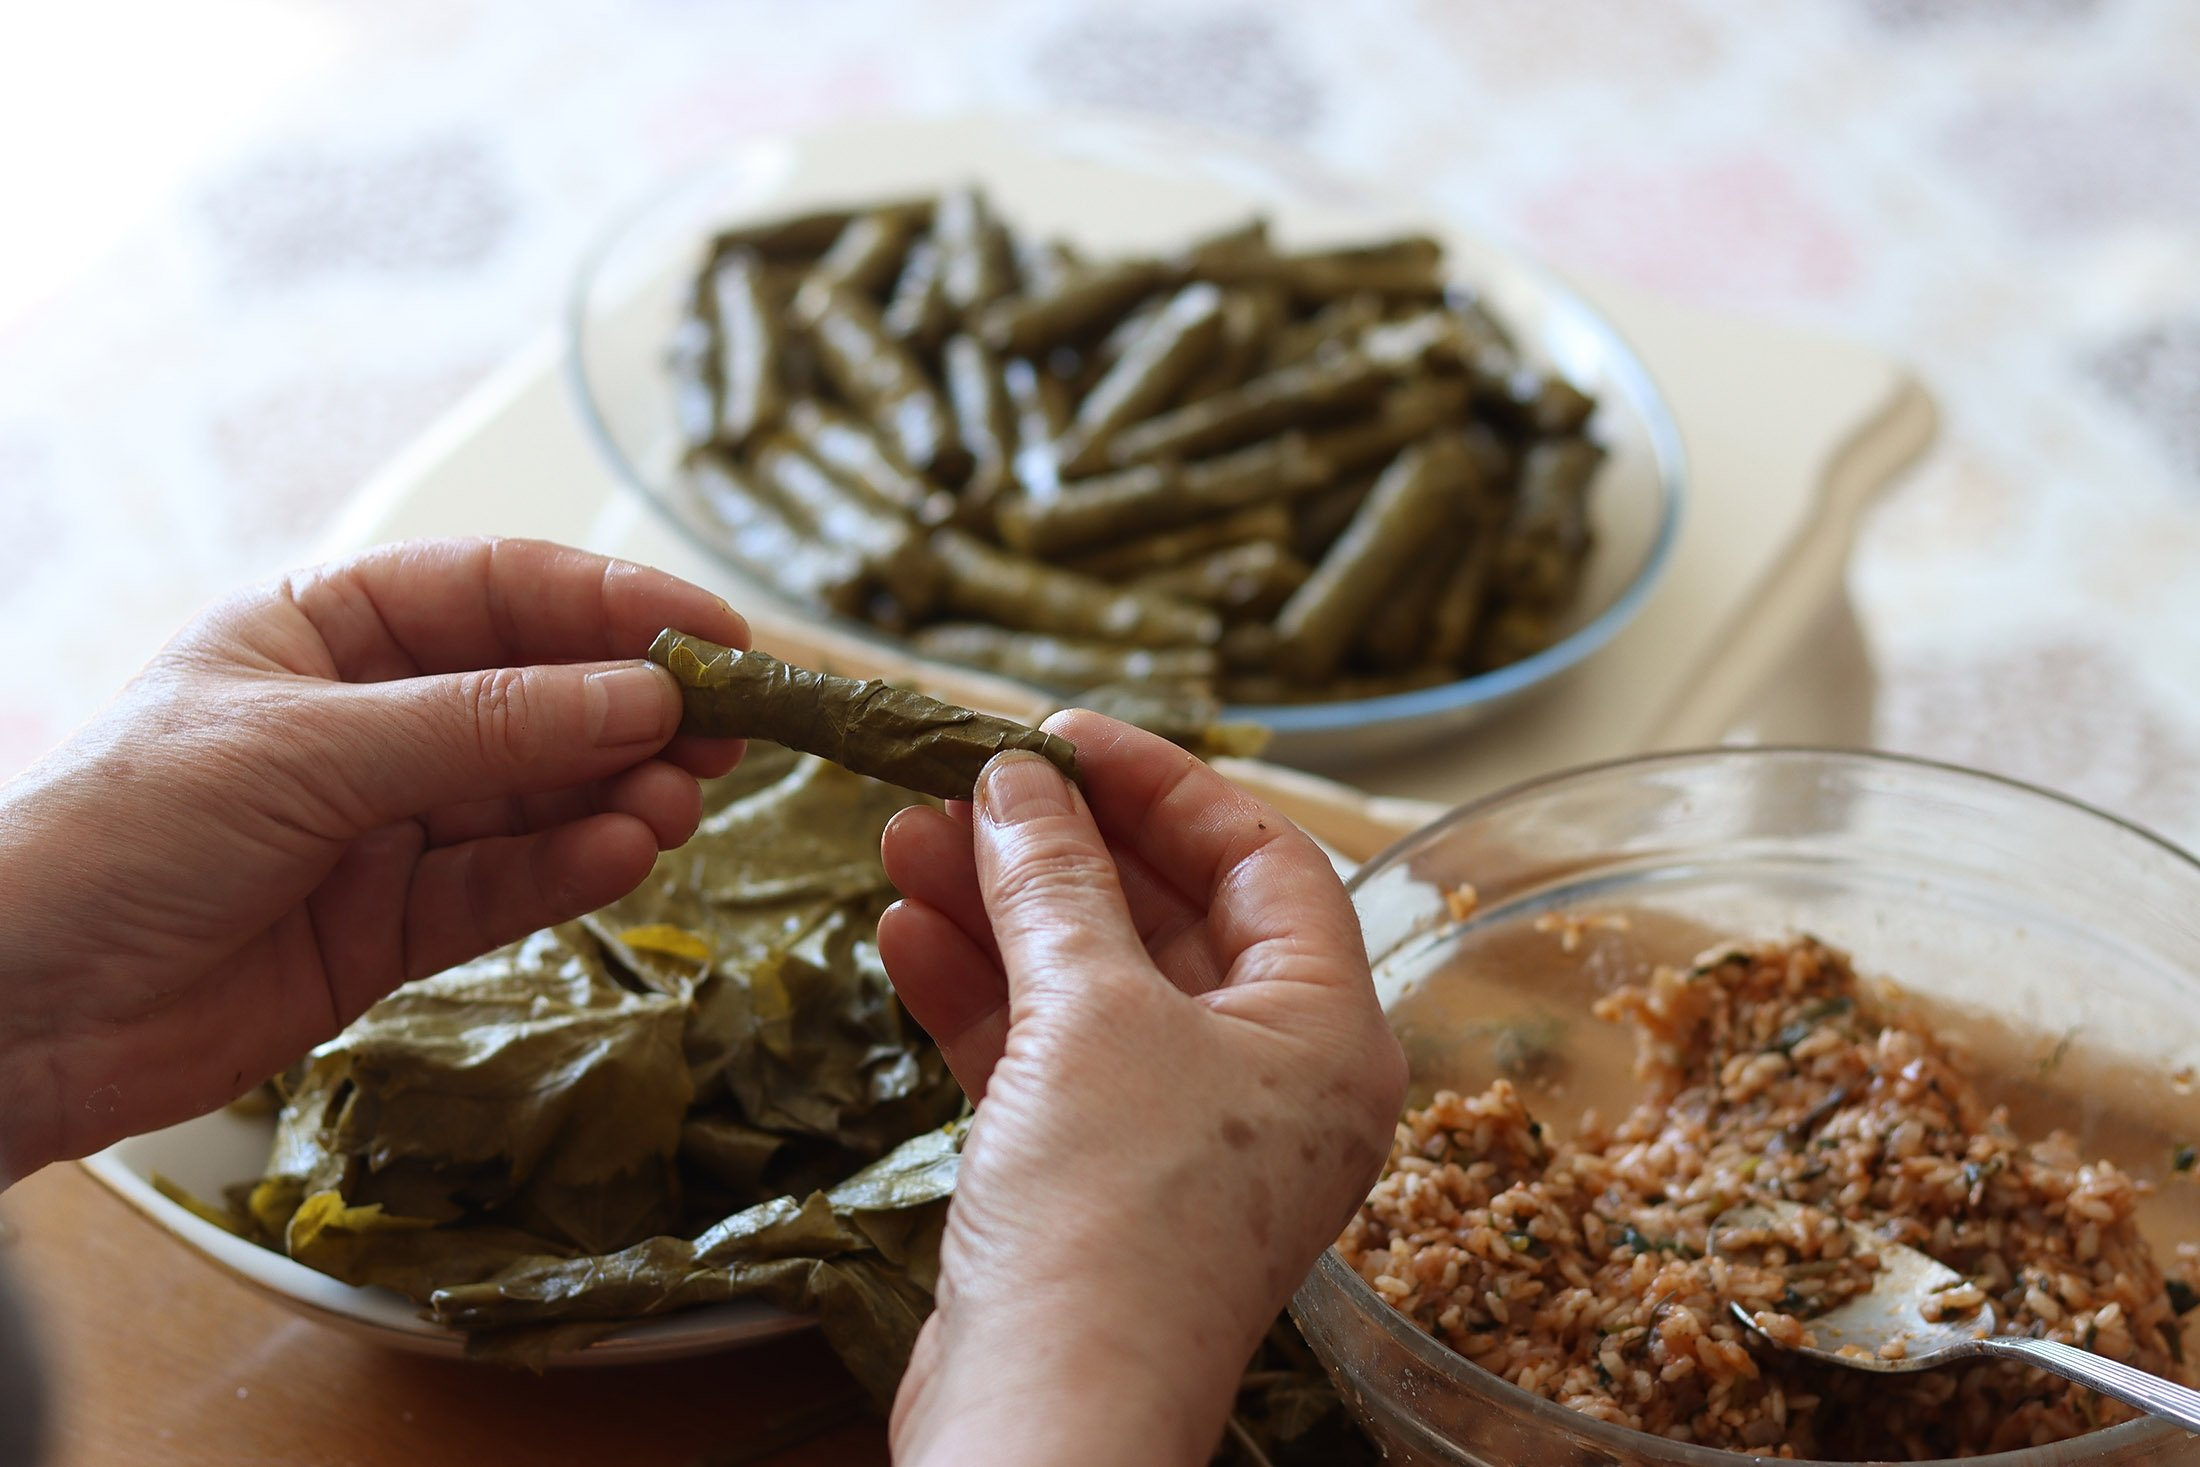 A woman makes the Turkish traditional yaprak sarma. (Shutterstock Photo)